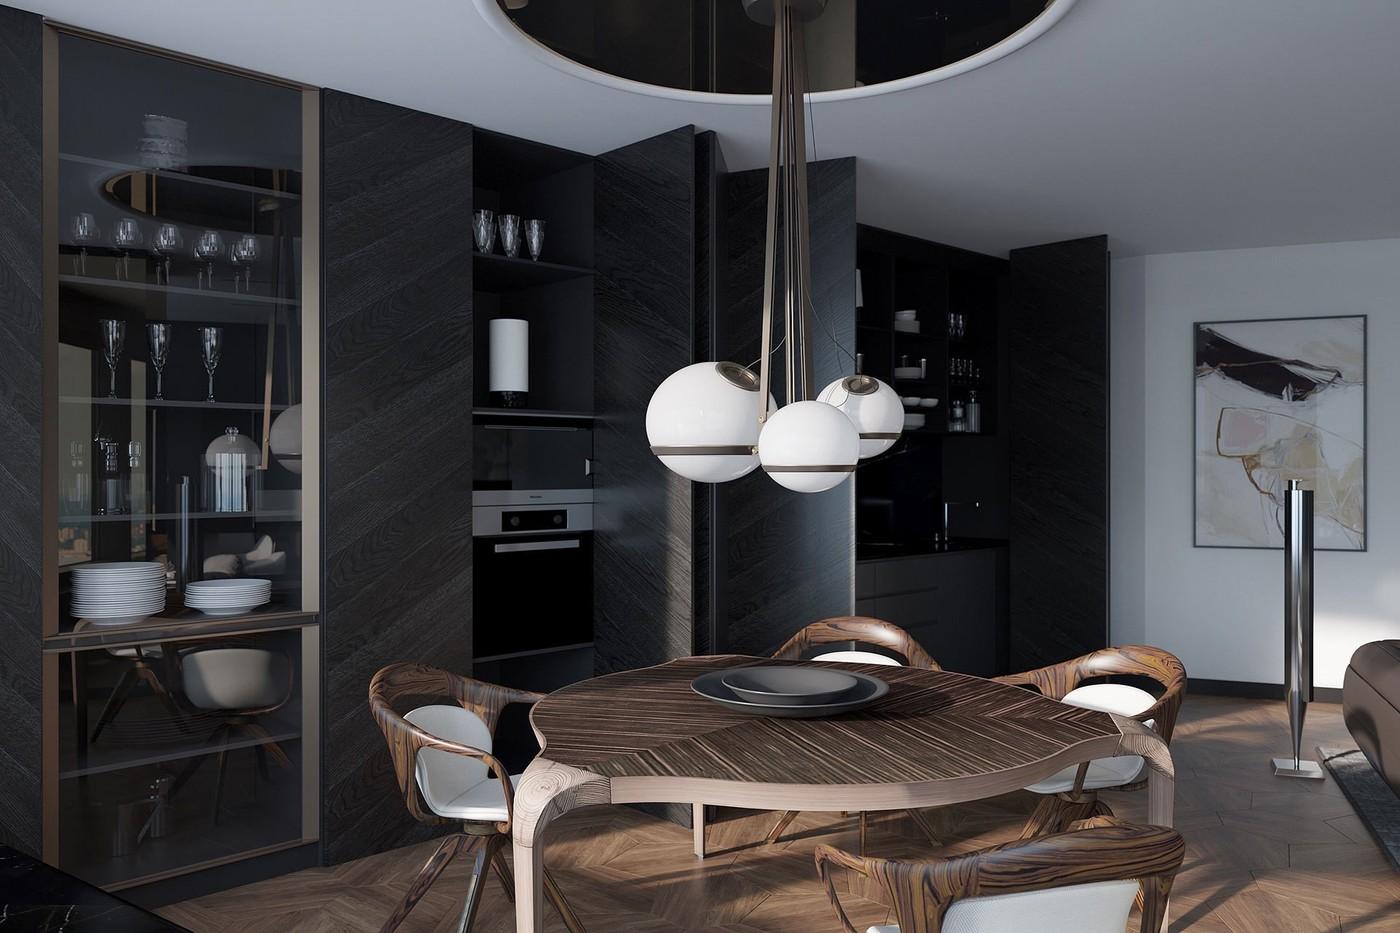 Стол Giorgetti Кало Коломбо в интерьере обеденной - Elizarova Design Studio